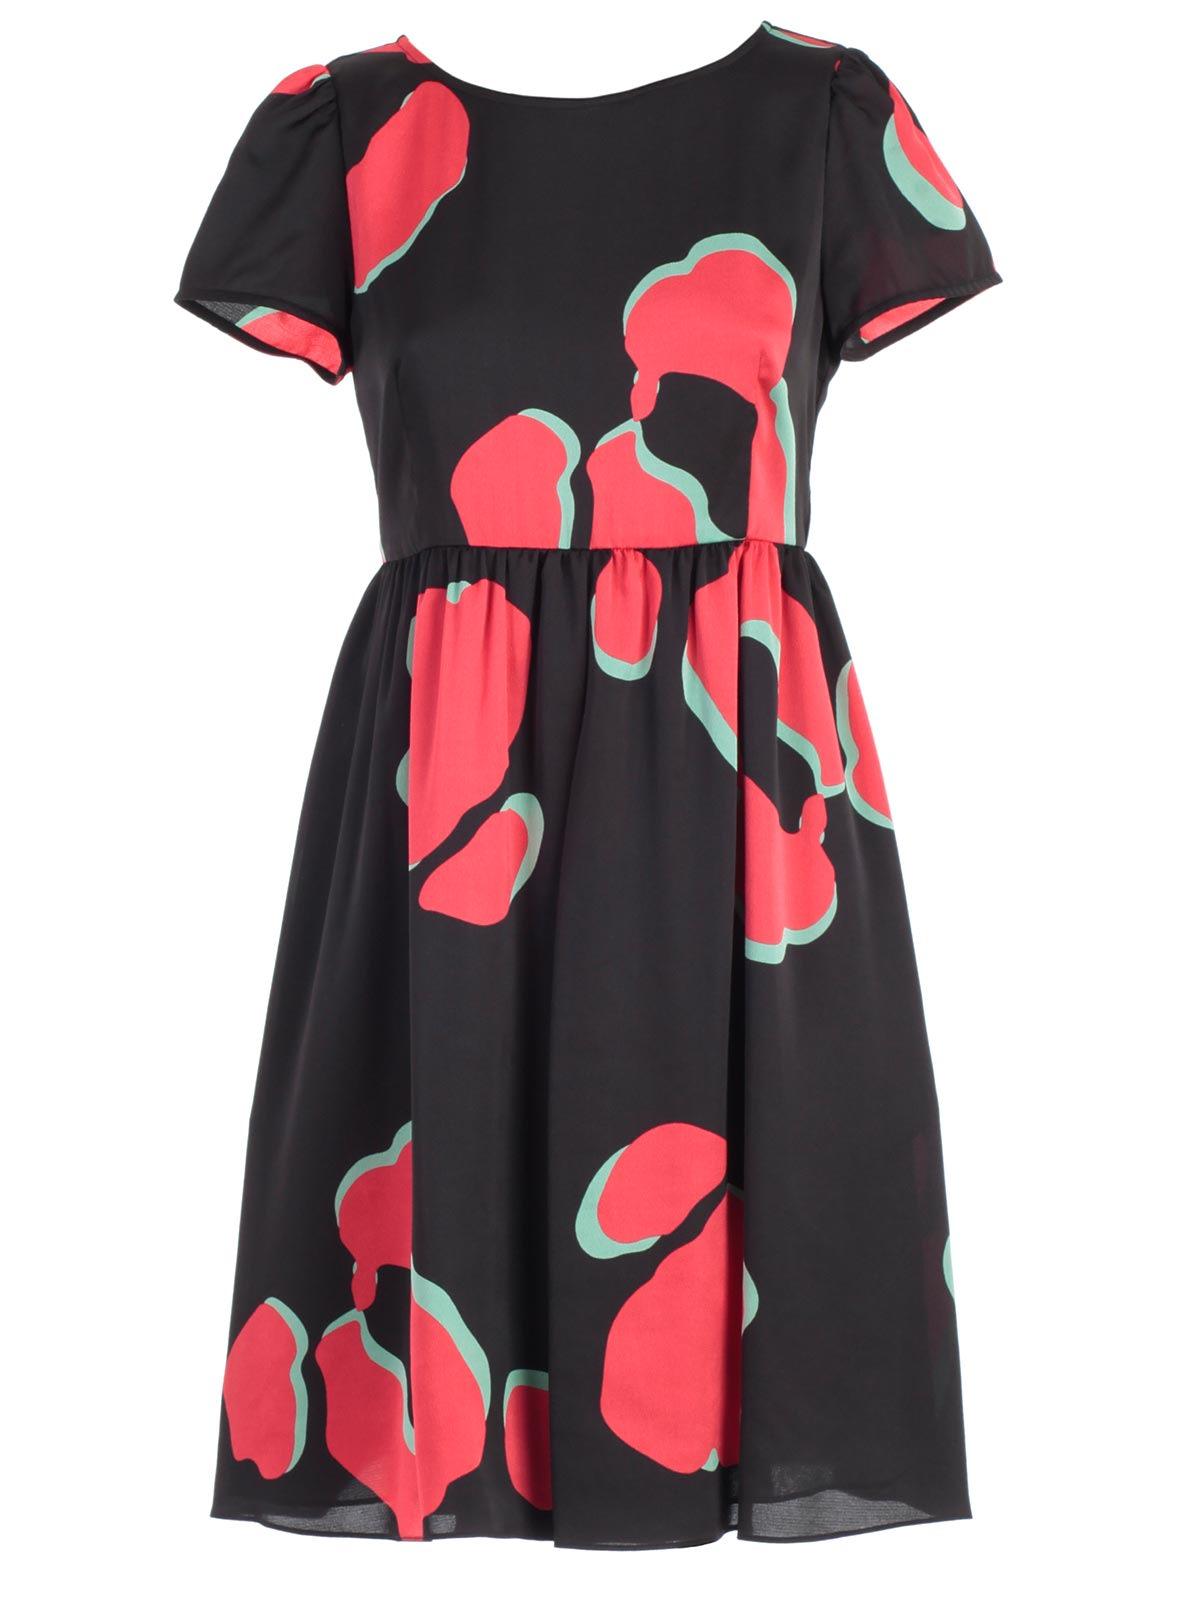 Emporio Armani Dress S & s Animalier Print